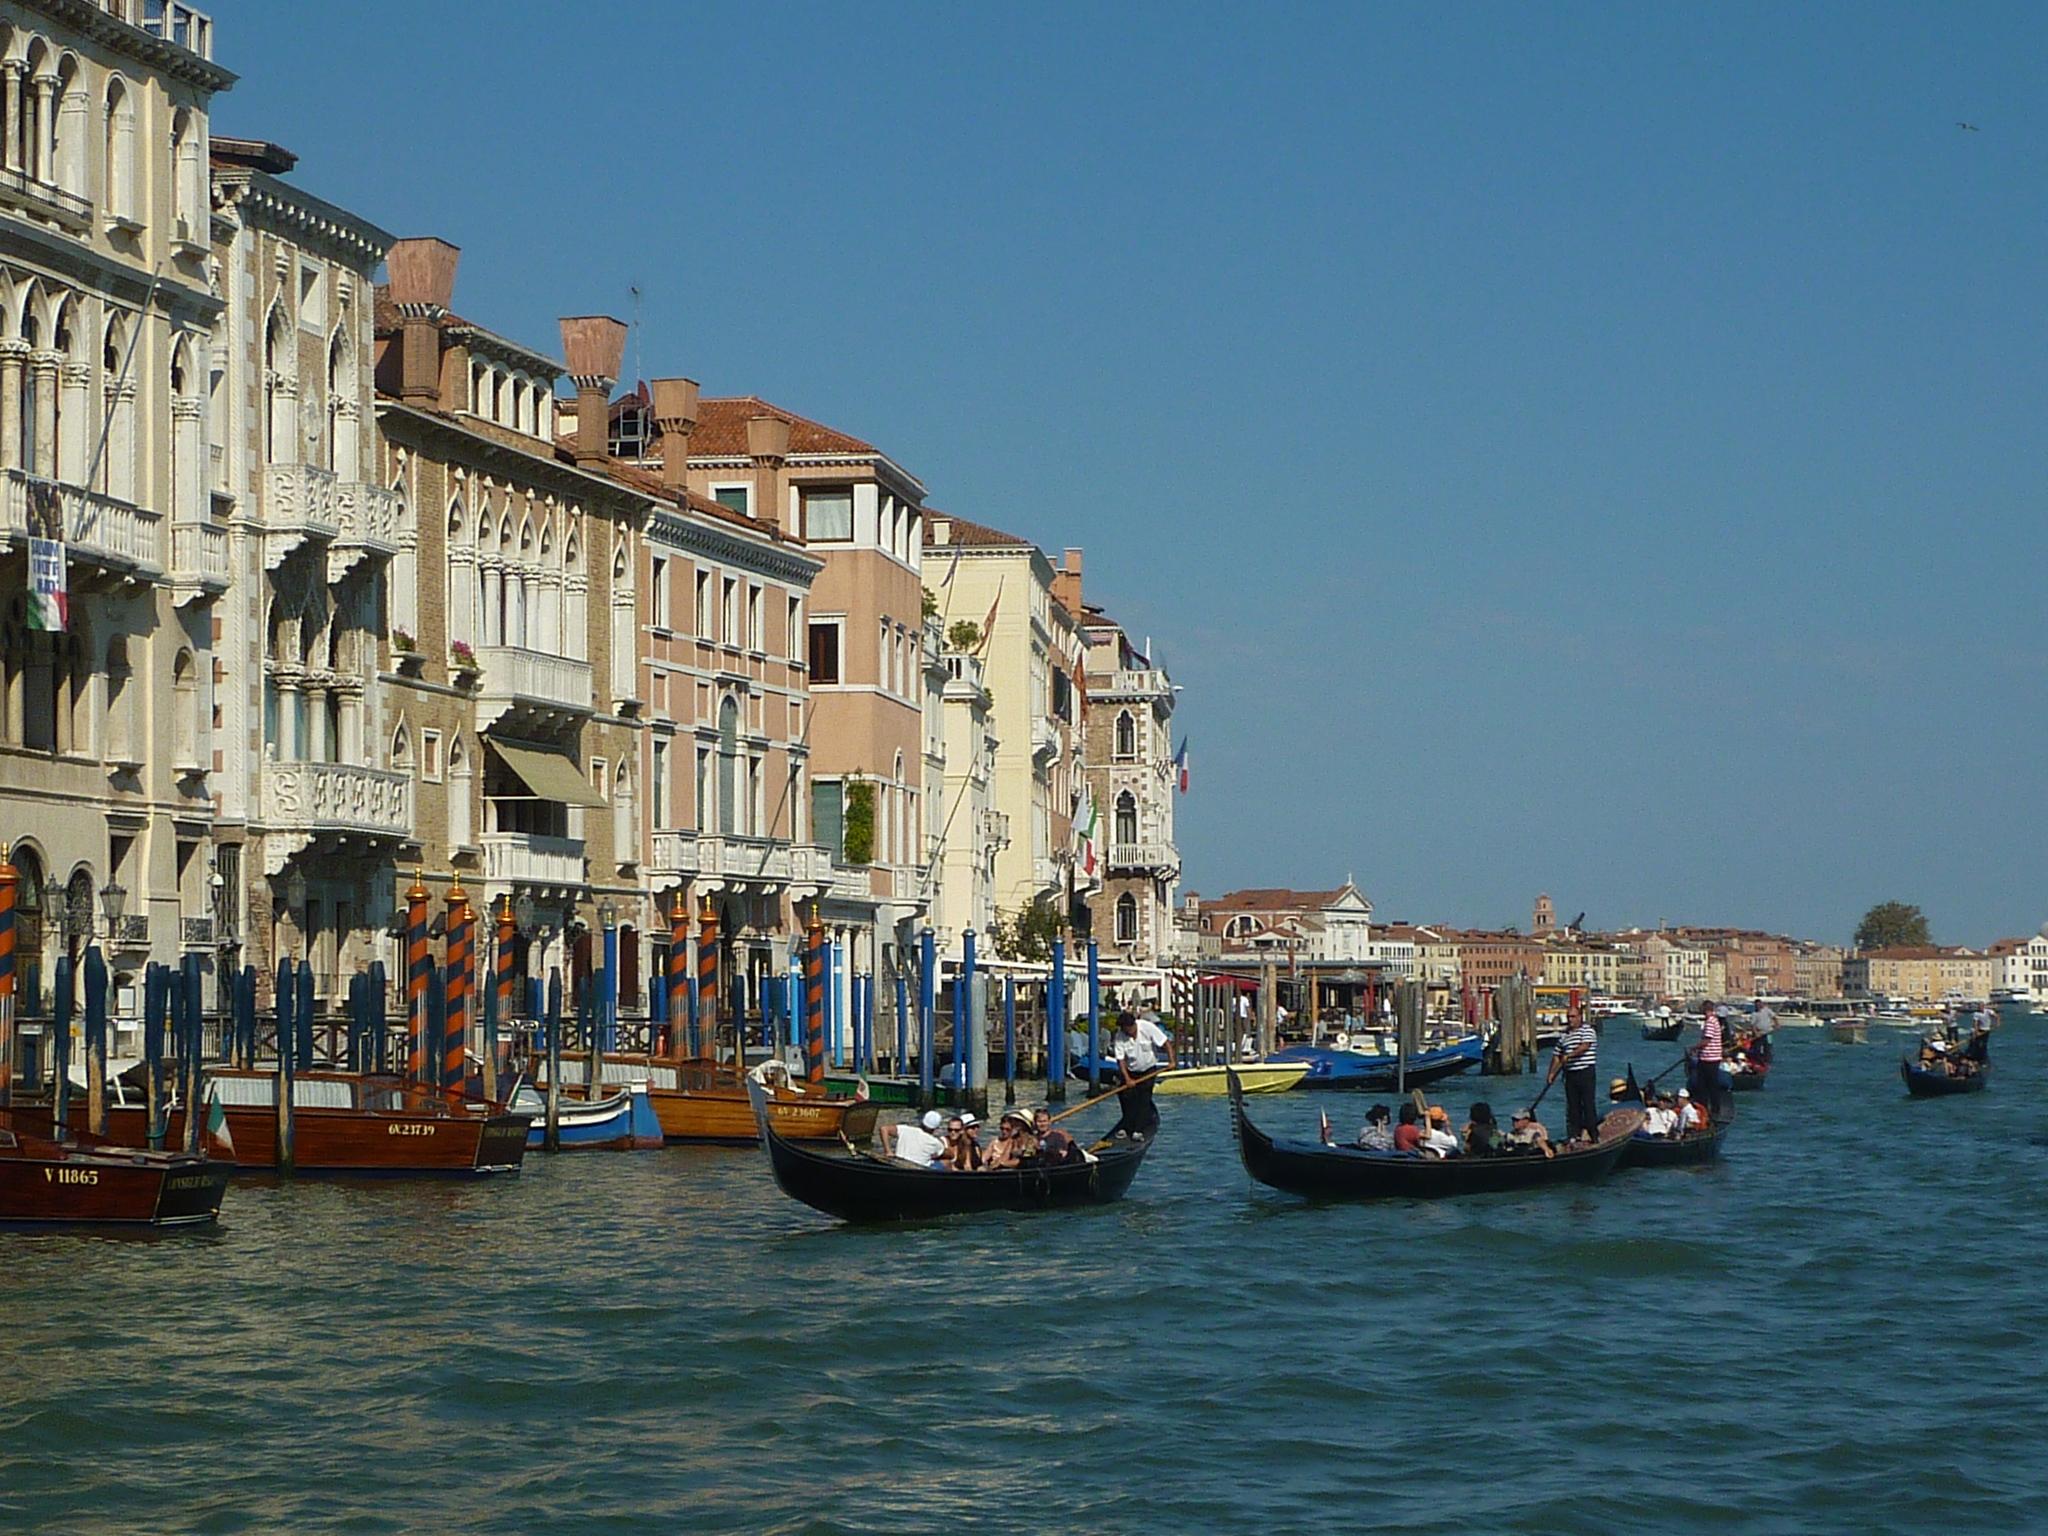 travel rome florence venice - photo#24